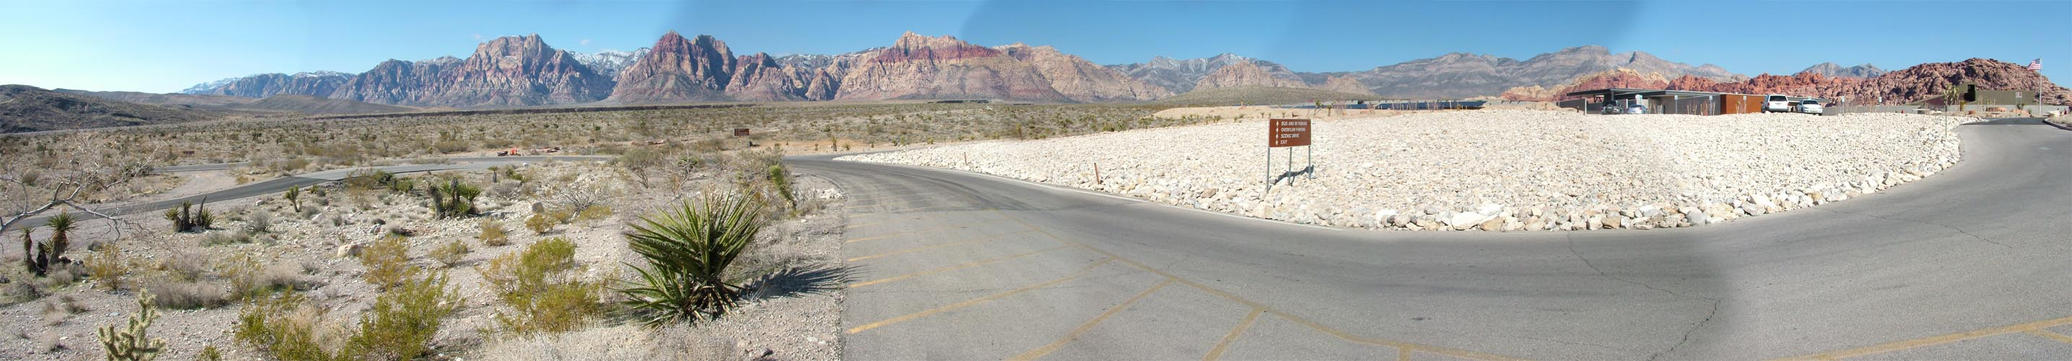 Red Rock Canyon Pano 2 by mackdj